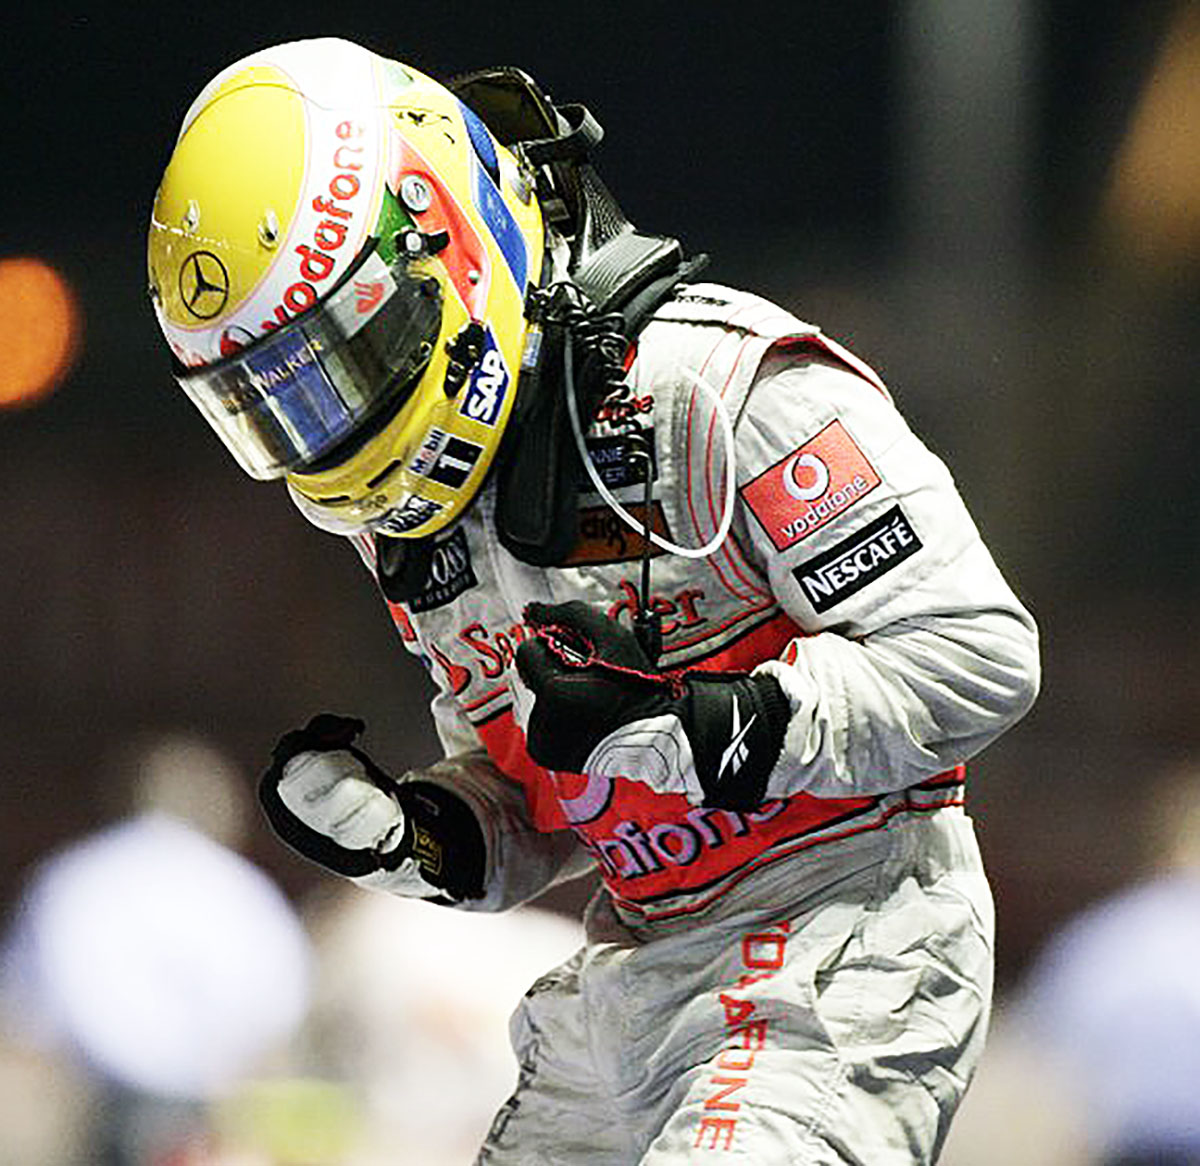 2009 Lewis Hamilton McLaren Mercedes Race Used F1 Suit ...